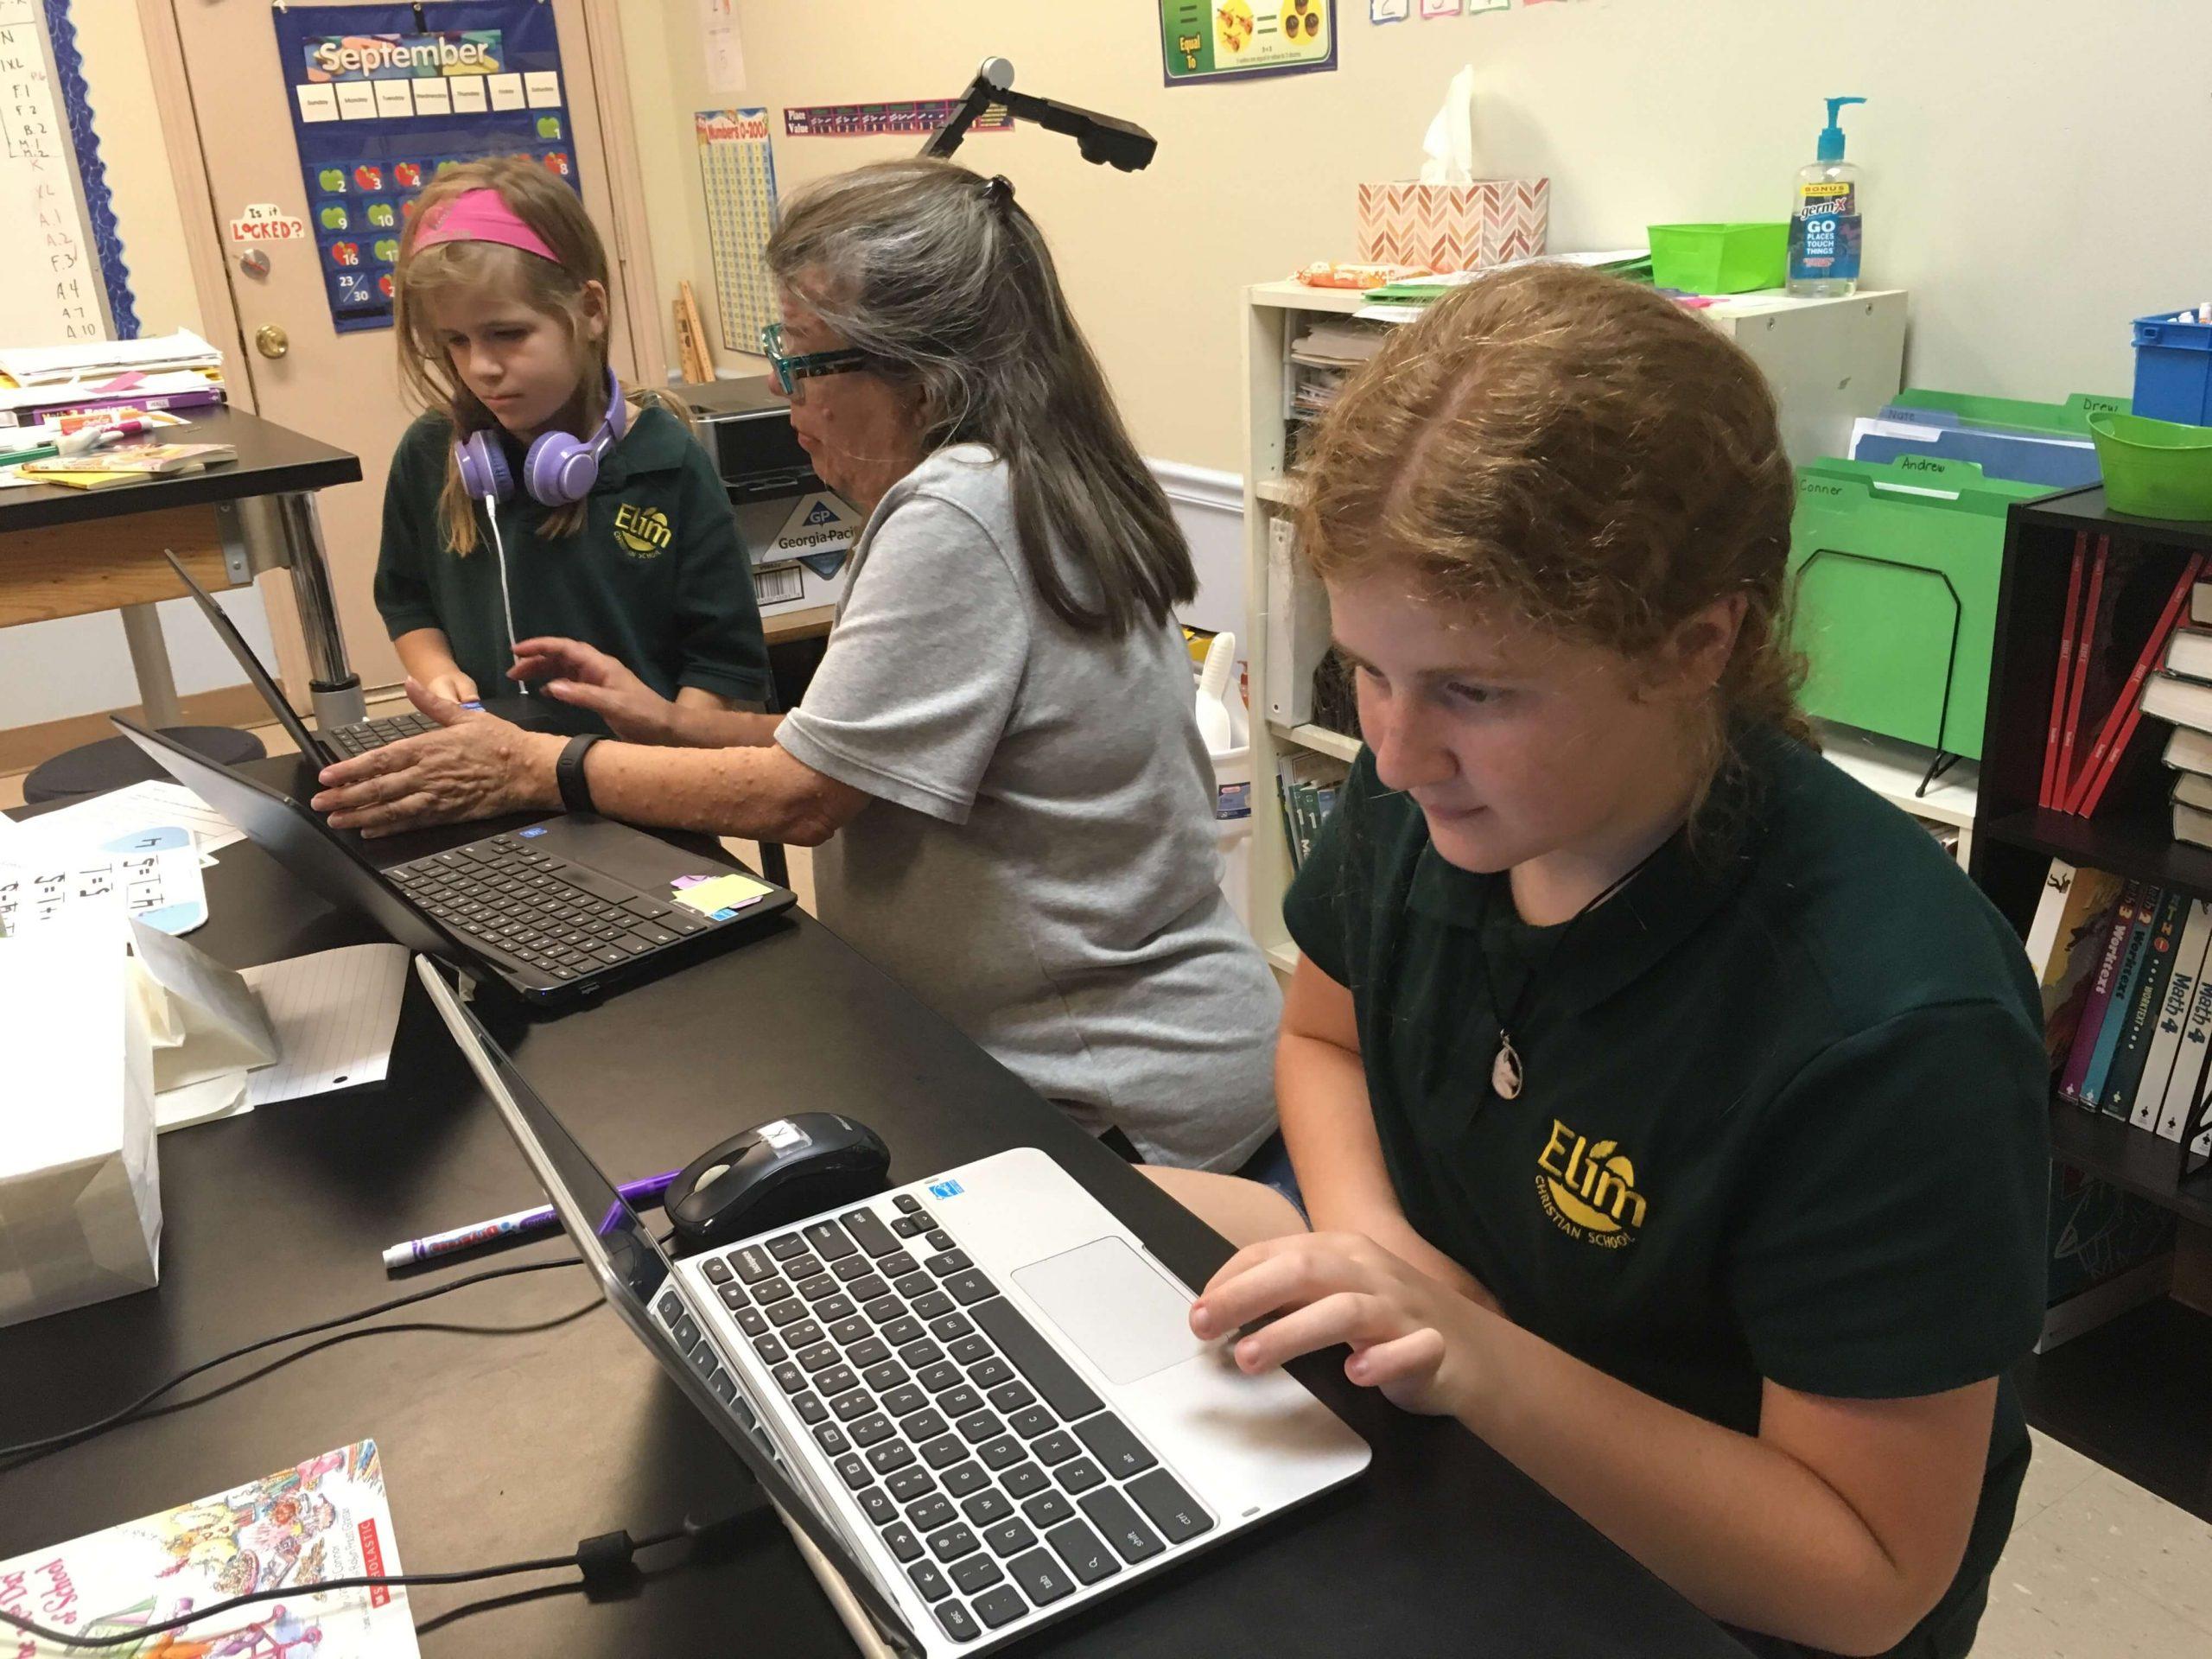 elim christian school students working on laptops